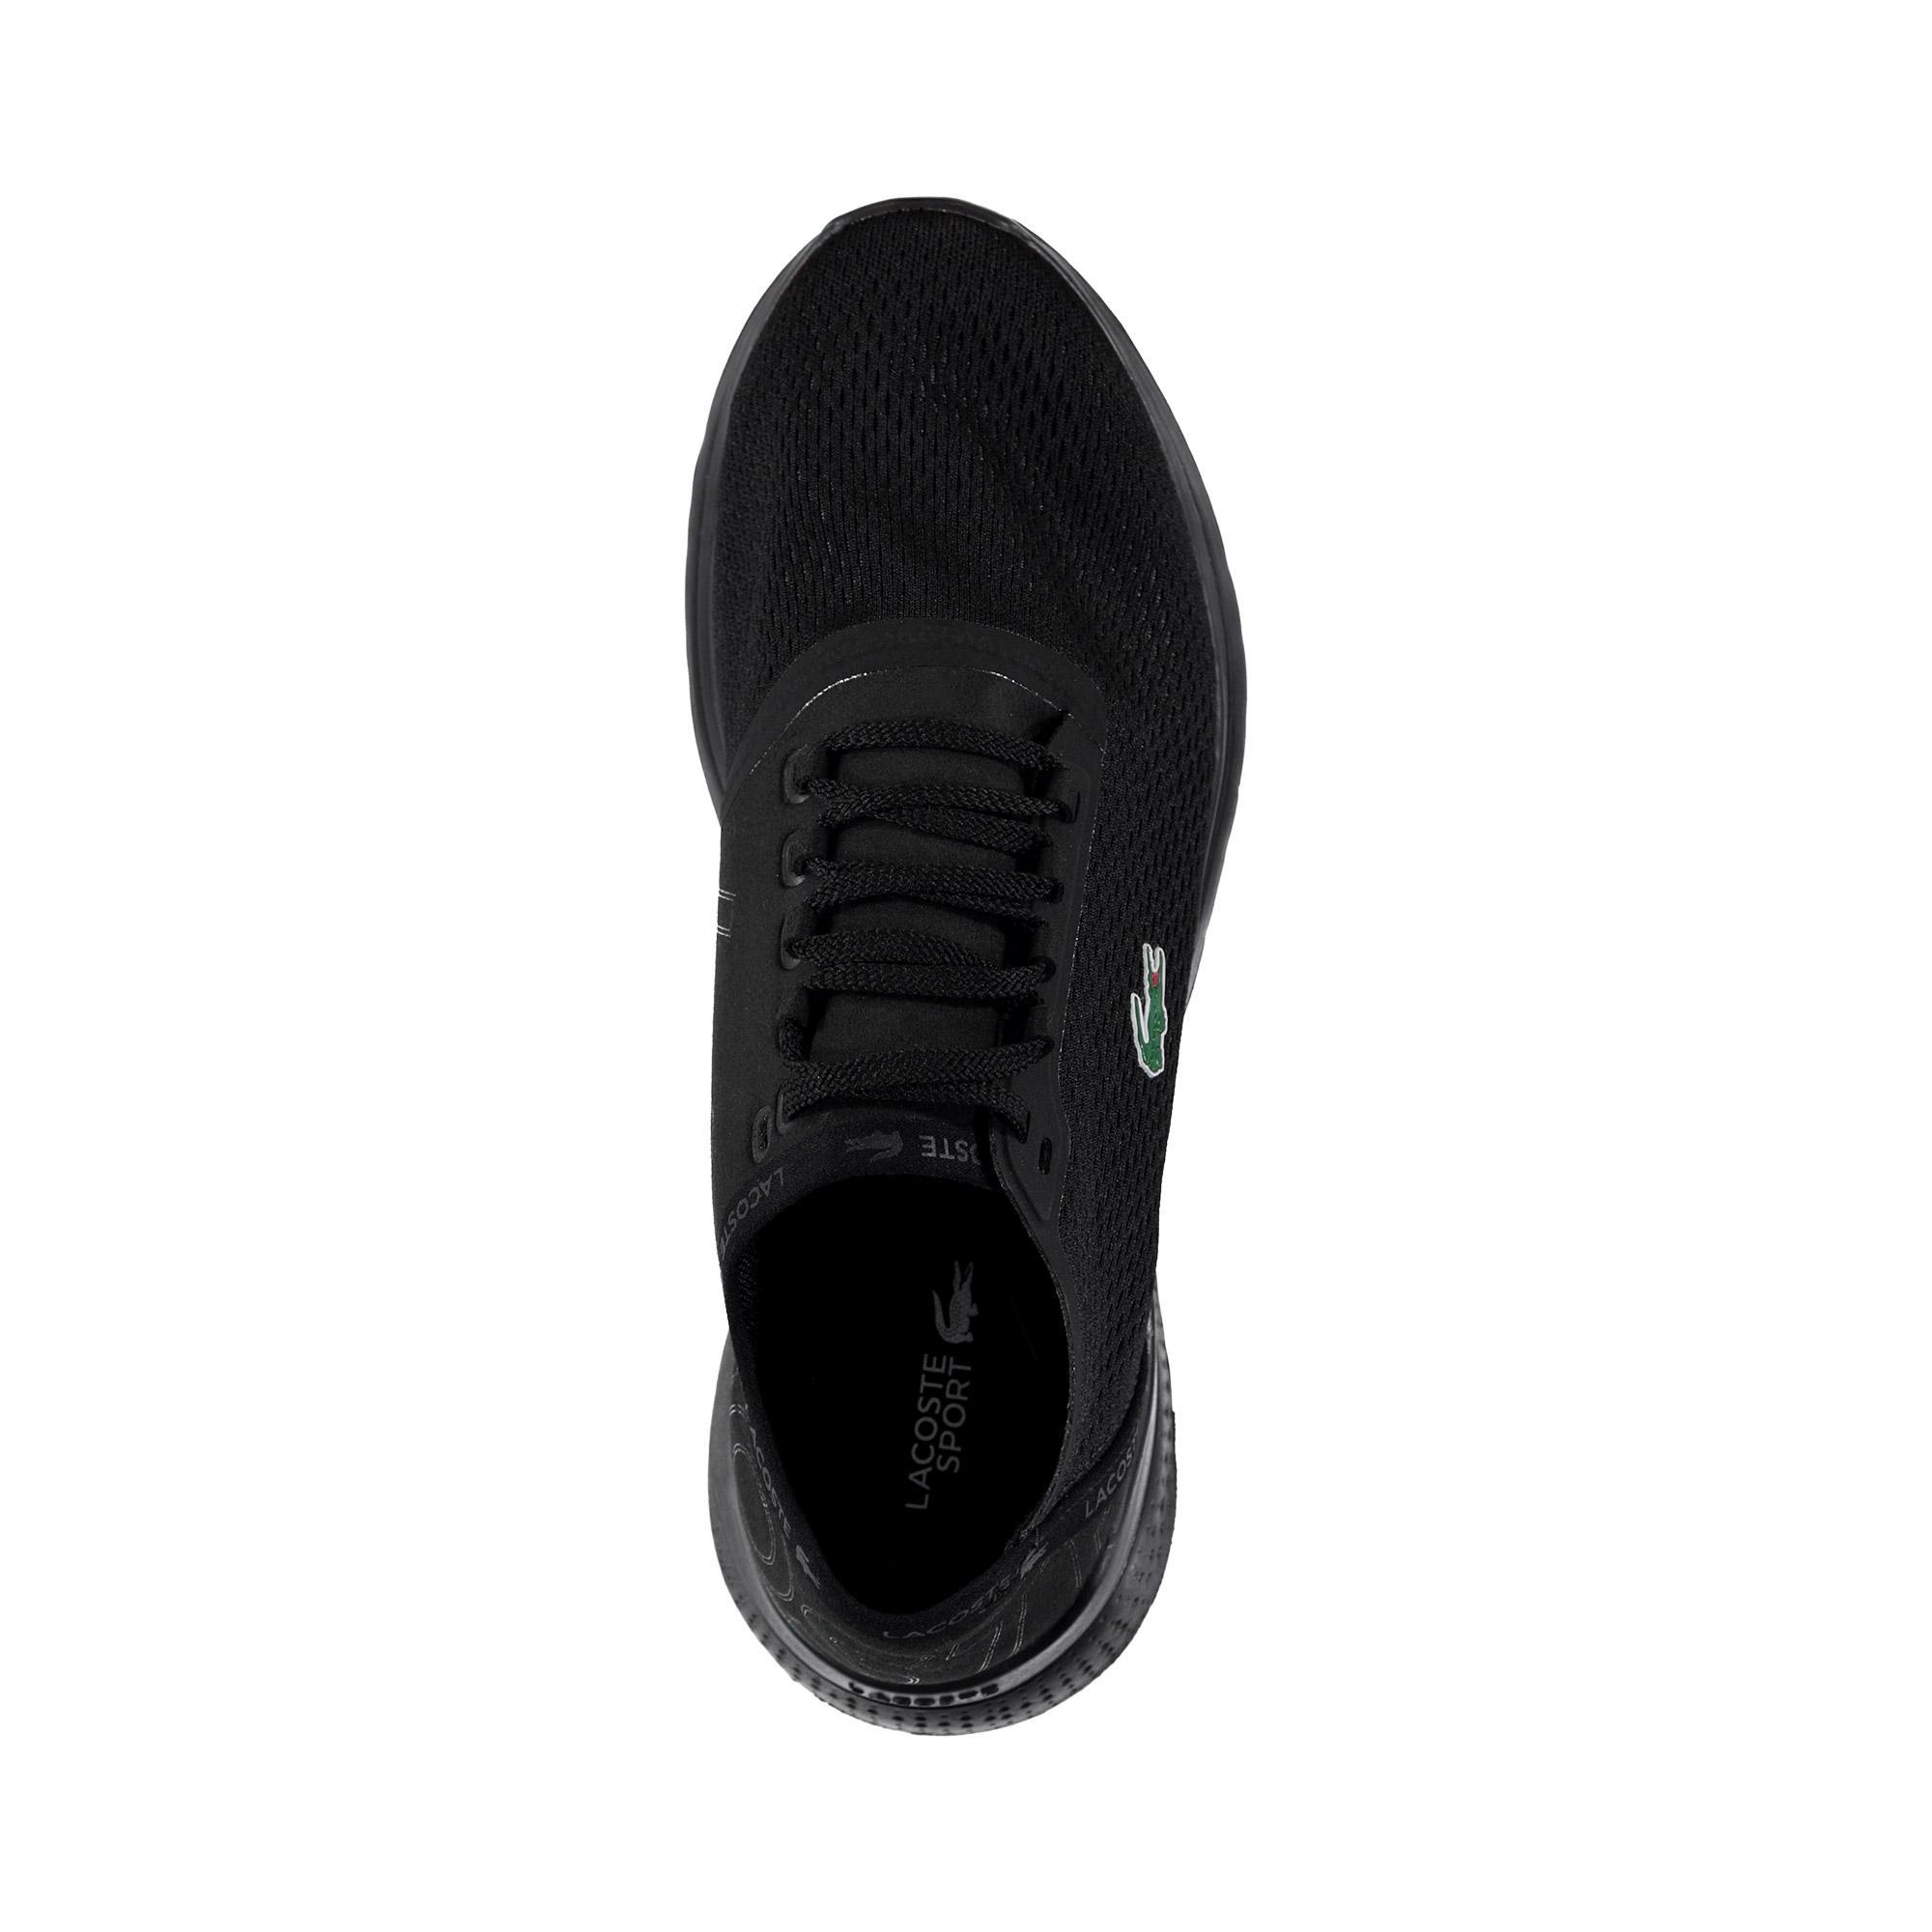 Lacoste Erkek Siyah LT Fit 119 4 Sneaker